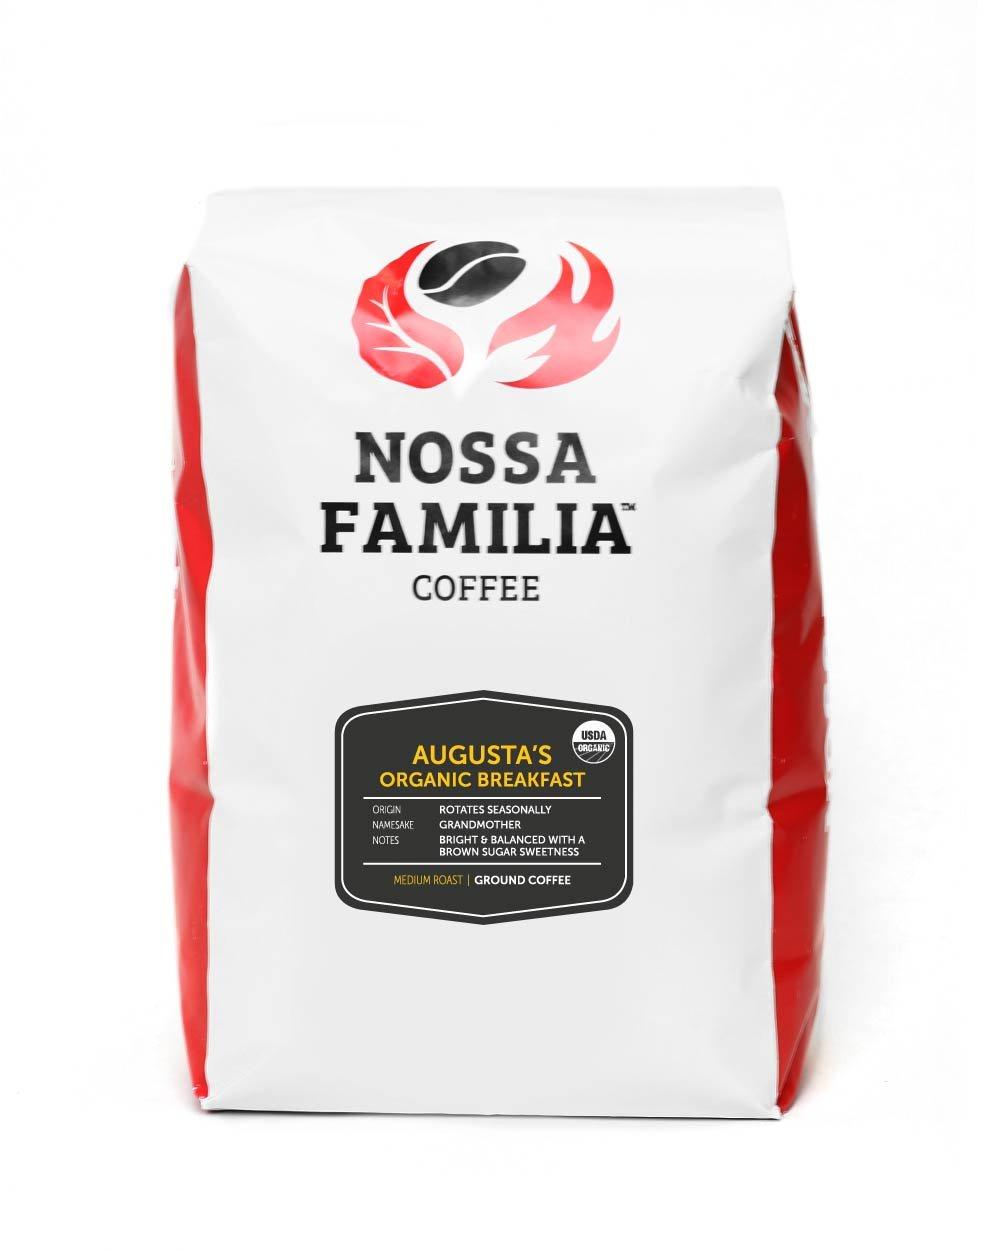 Organic-Fair-Trade-Coffee Medium-Roast, Augusta's 2lb Ground